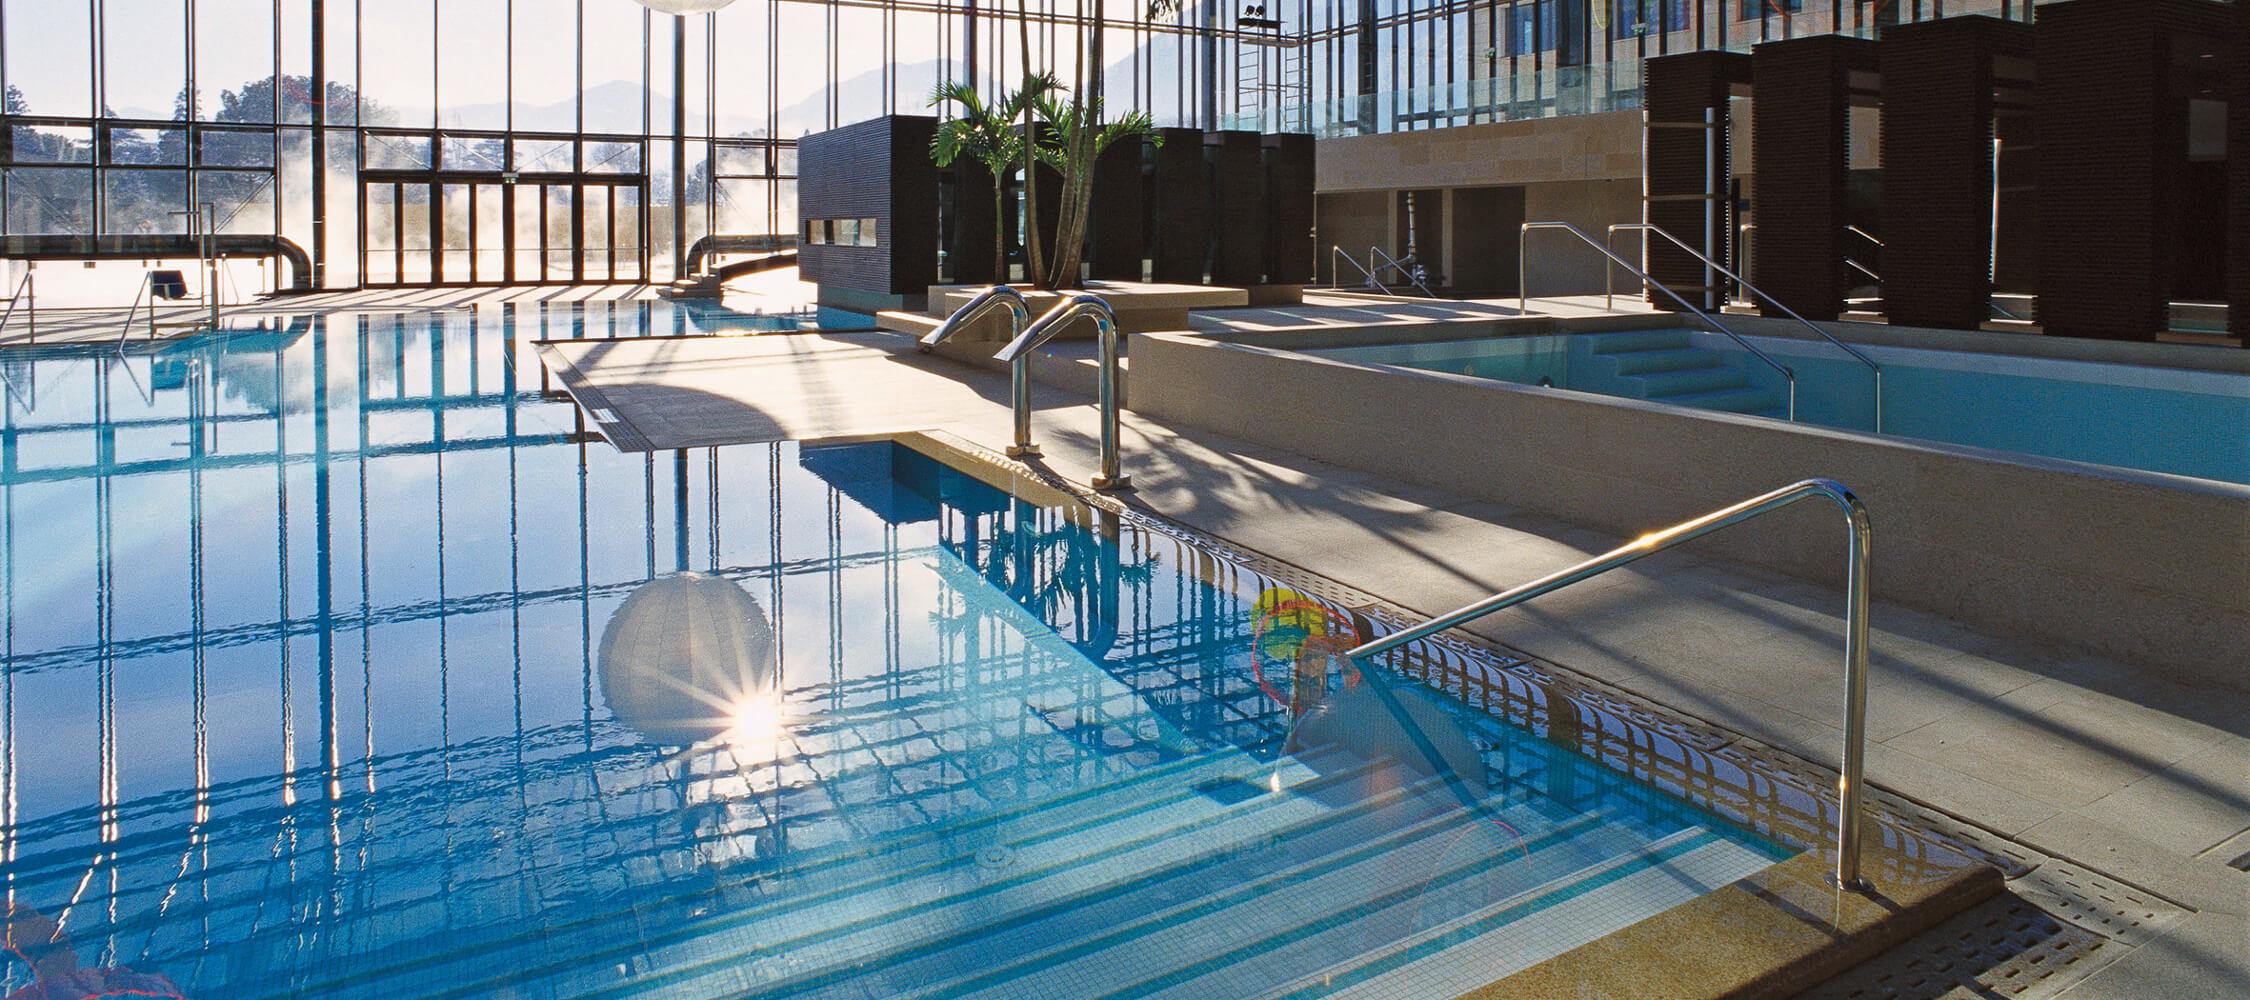 Italien-Trentino_Suedtirol_Alto_Adige_Merano_Meran_Therme_Pool_Badehalle_Schwimmbad_Manuela_Prossliner_02_2250x1000